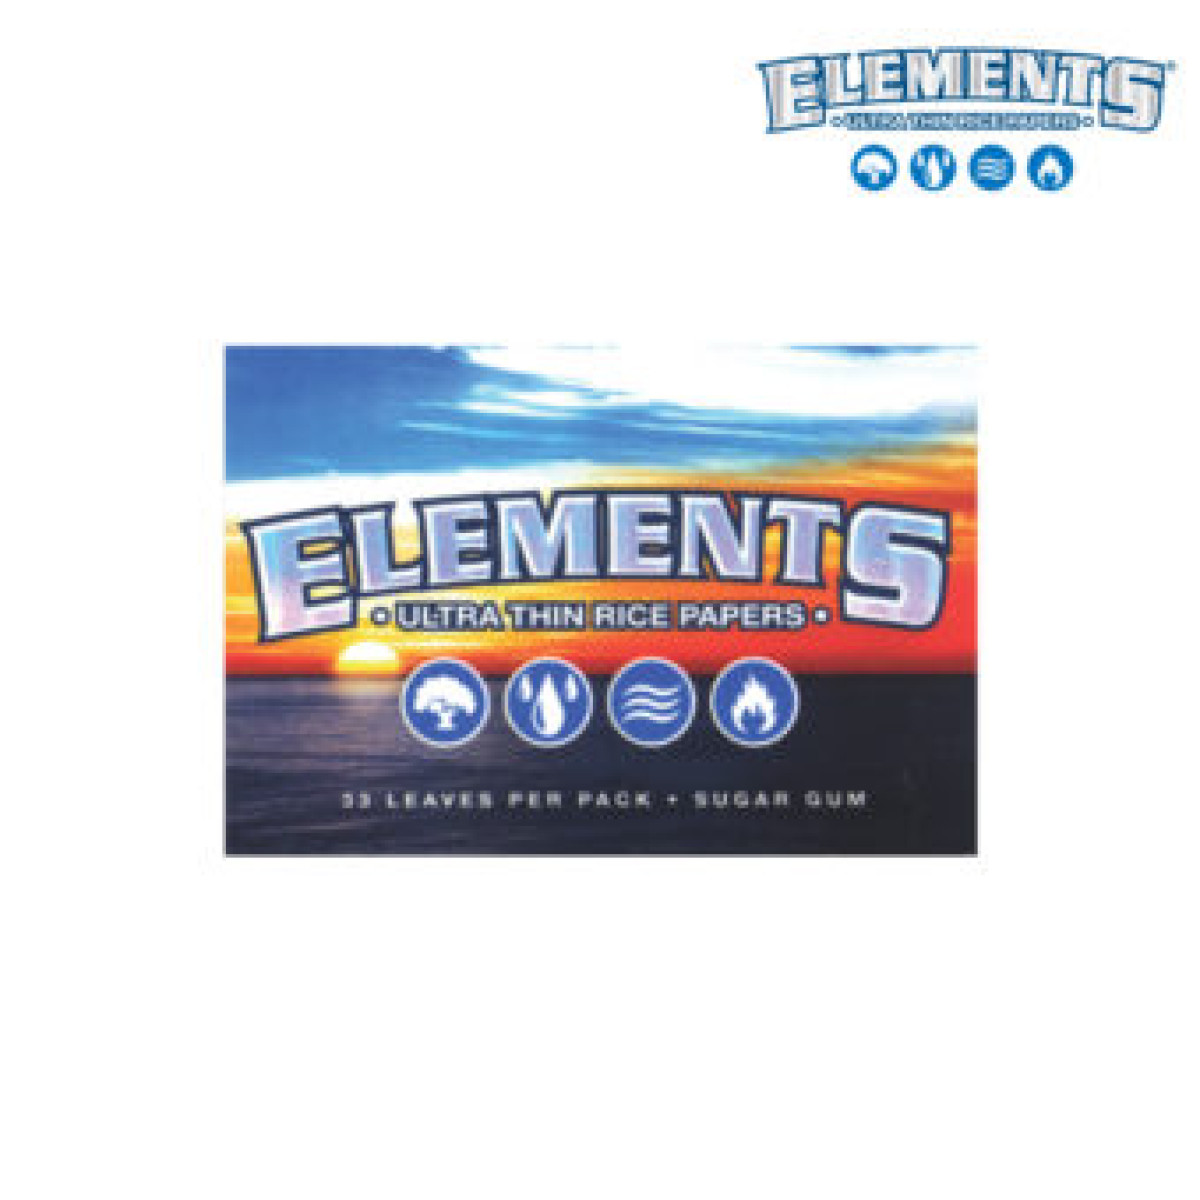 ELEMENTS SINGLE WIDE DOUBLE